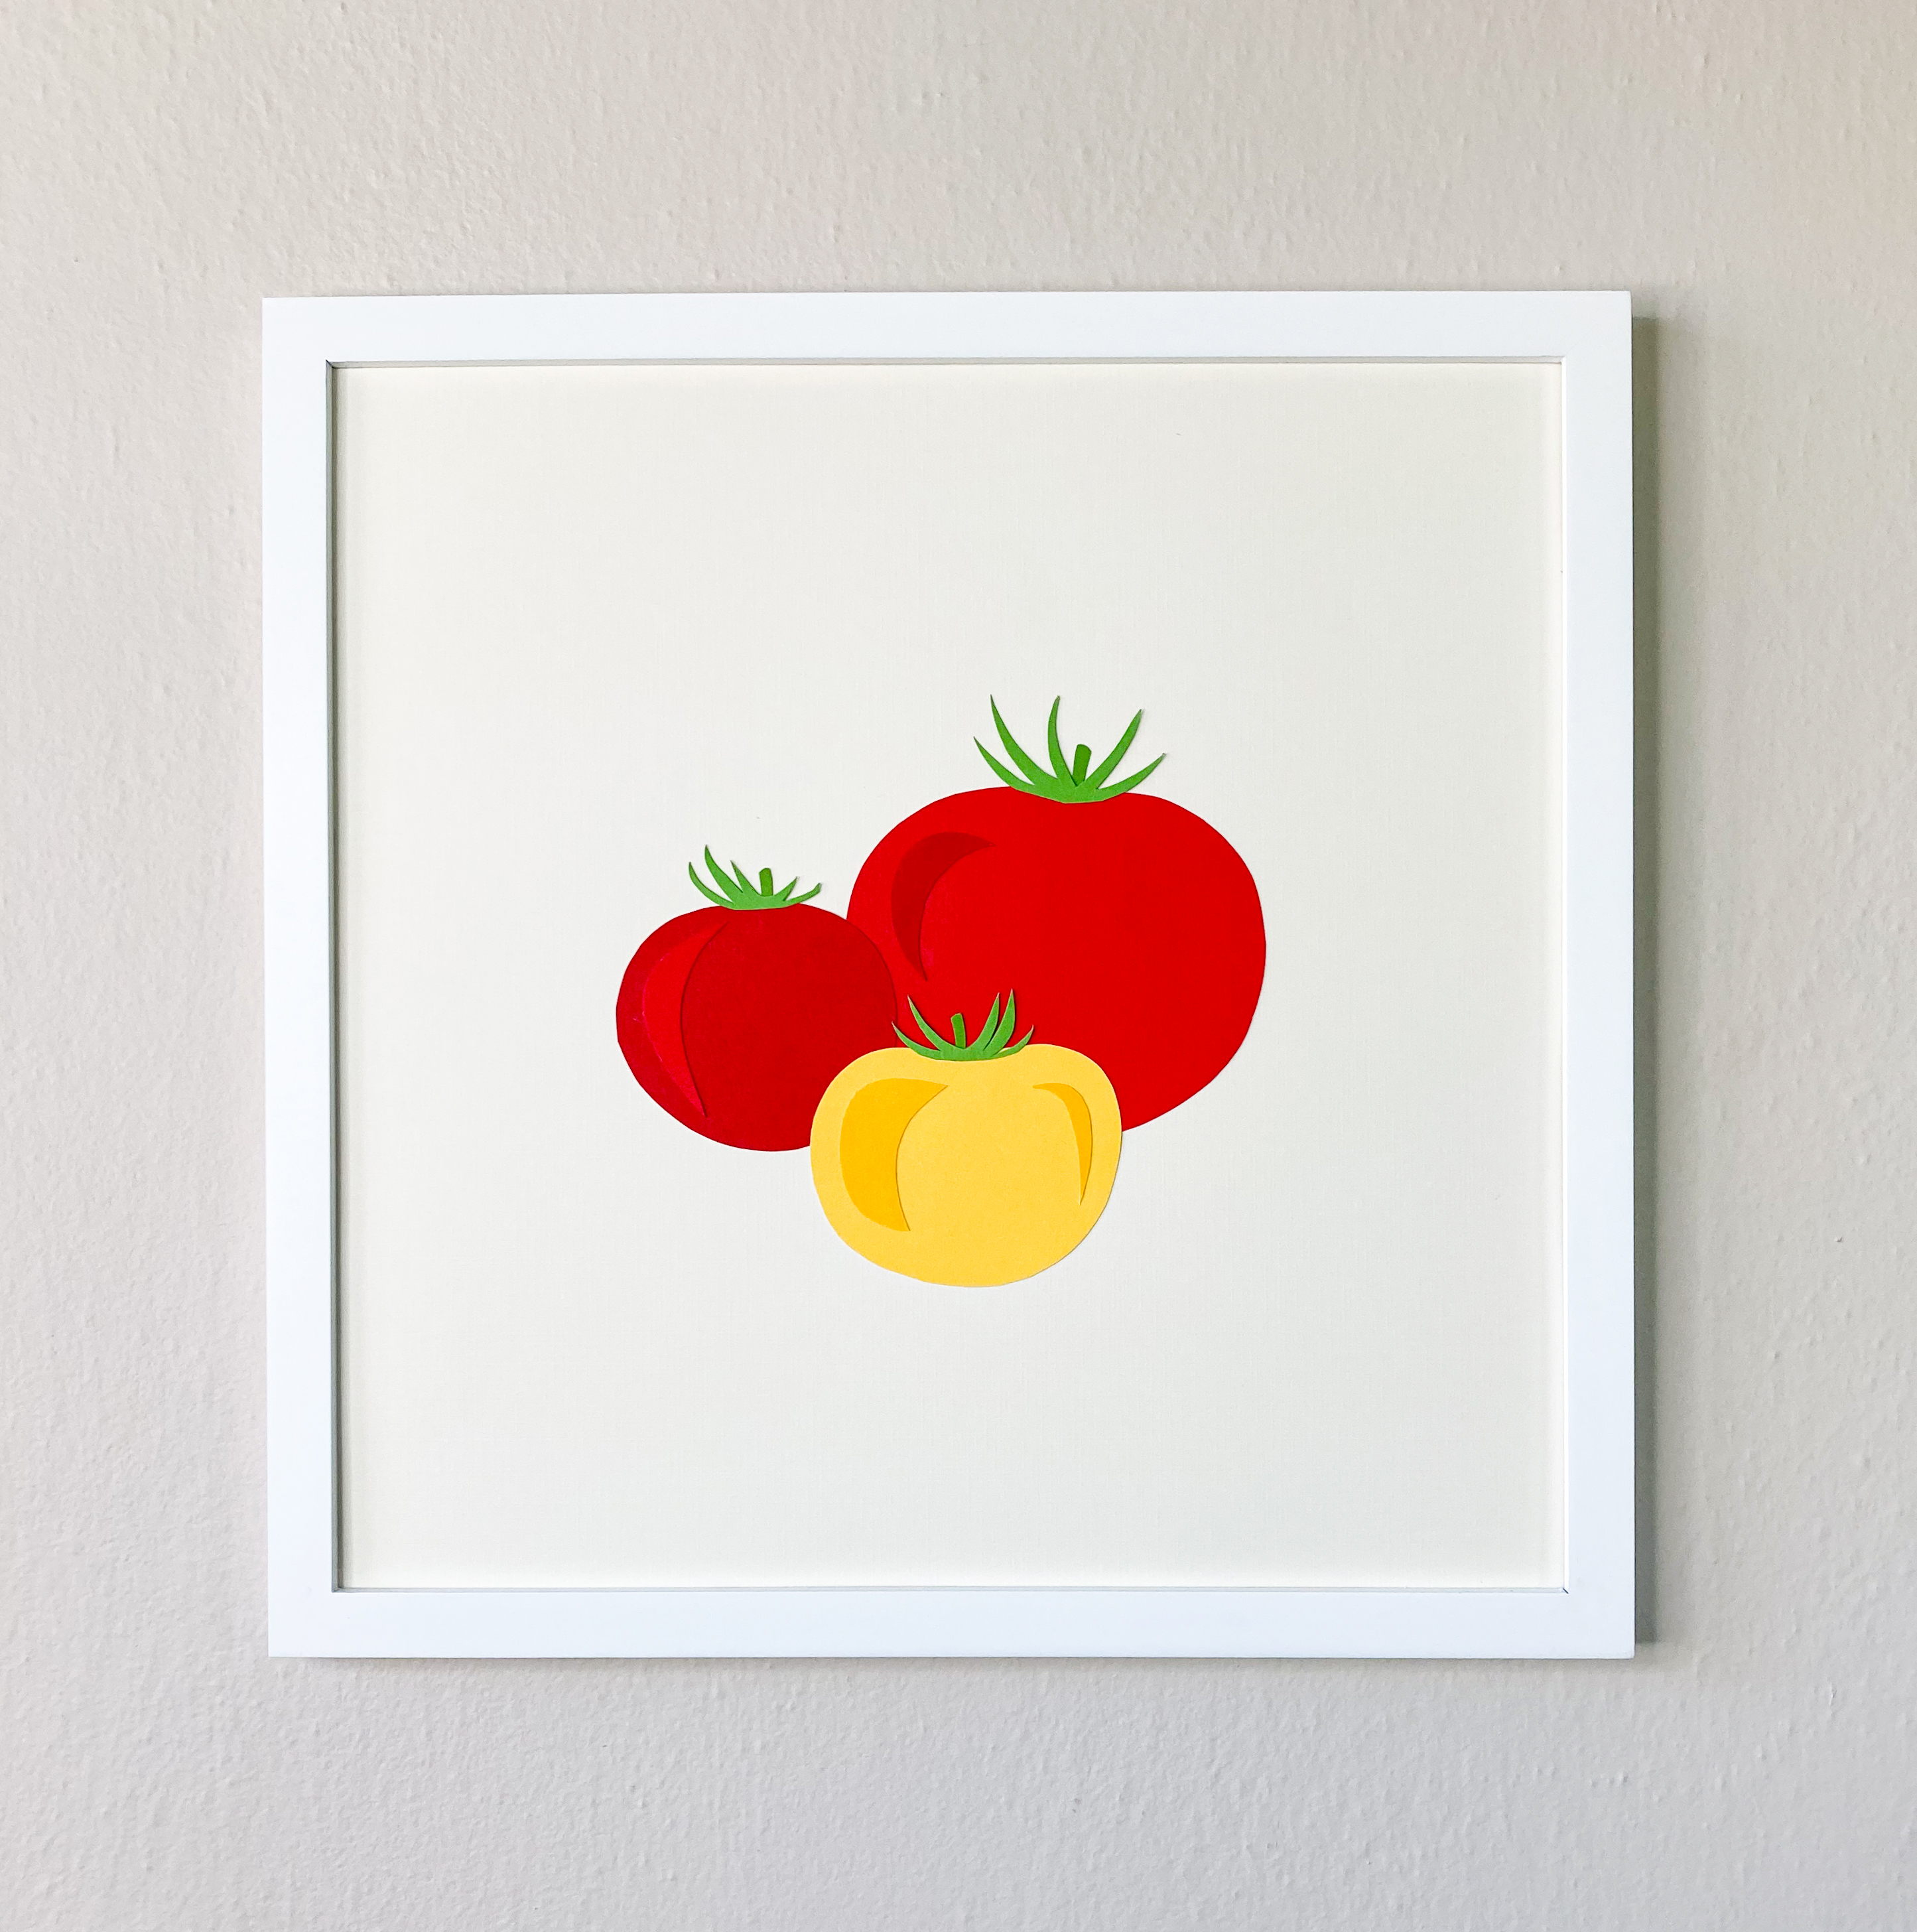 Heirloom Tomatoes | 12 x 12 Cut Paper $100